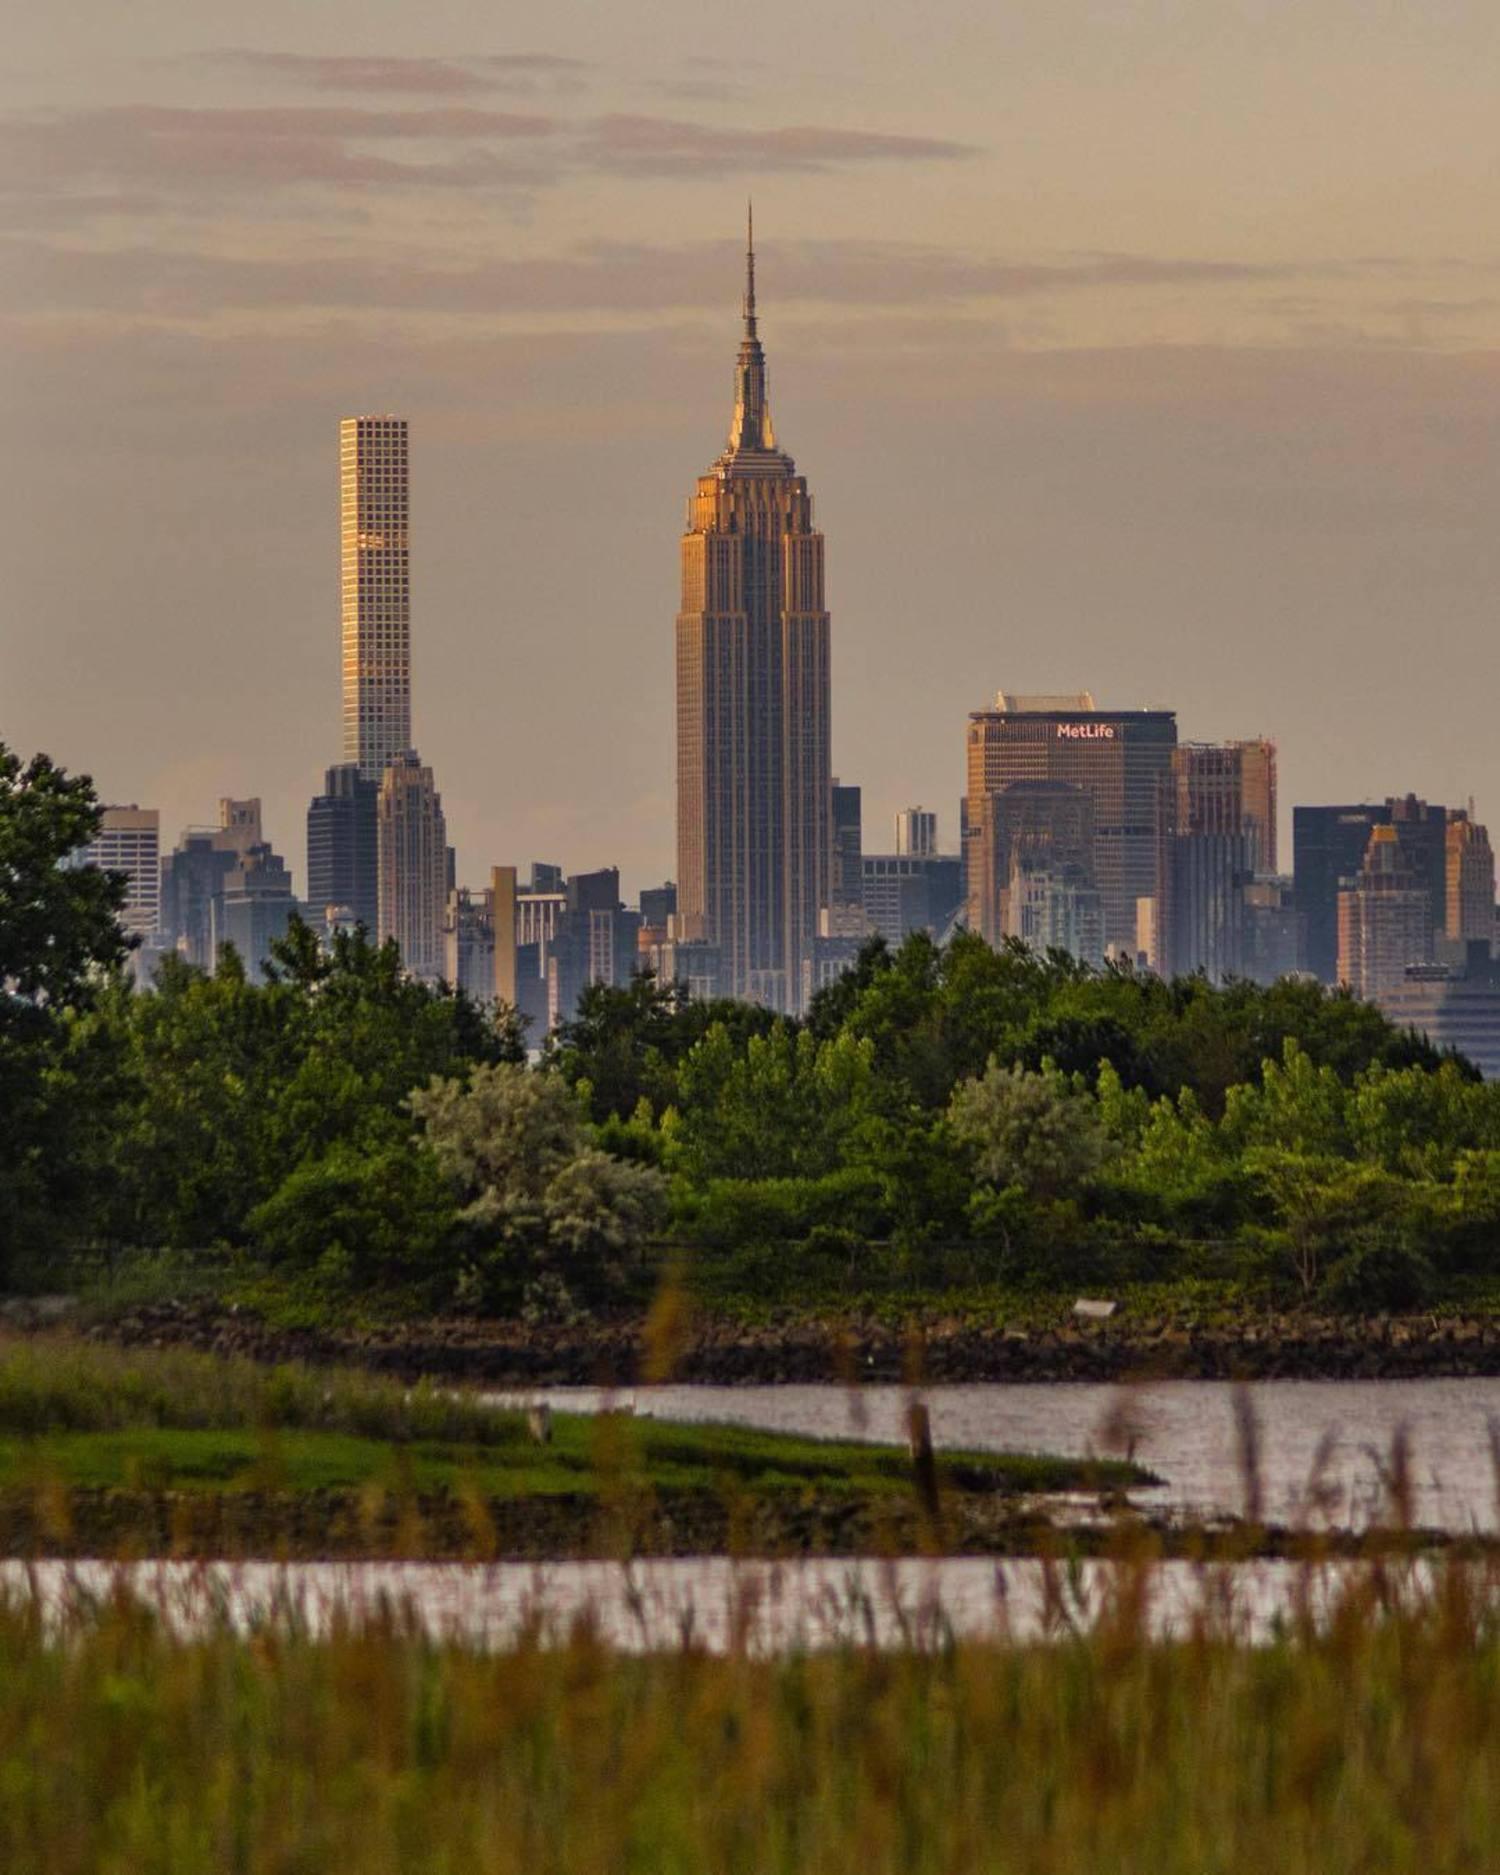 New York, New York. Photo via @eyecatchingphoto #viewingnyc #newyork #newyorkcity #nyc